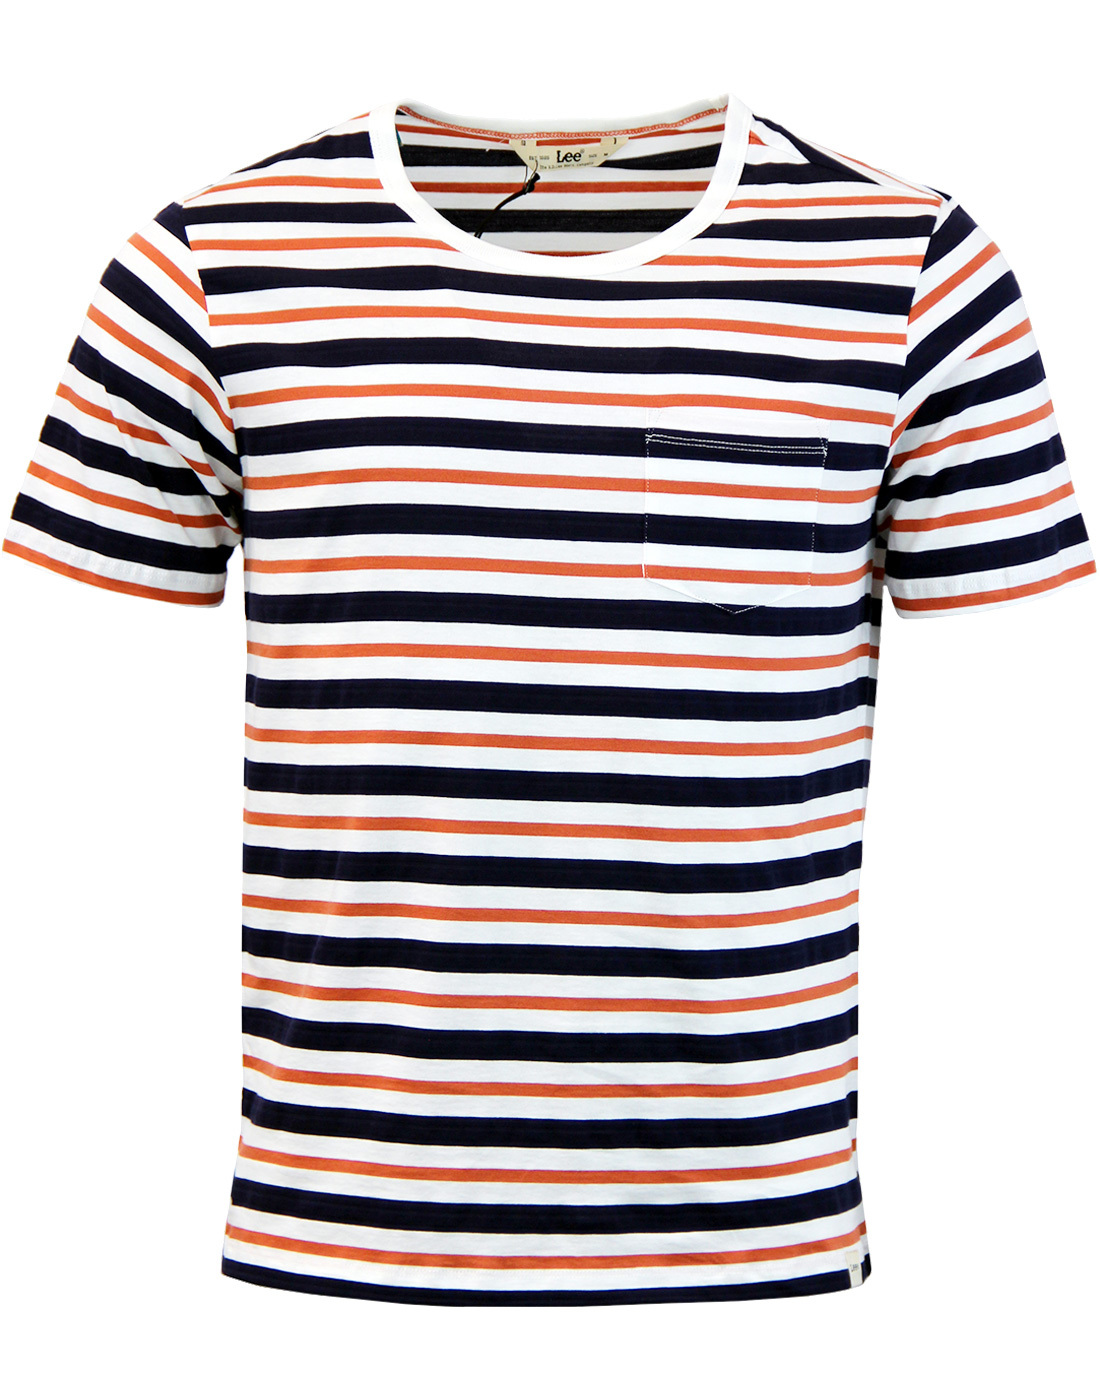 LEE Retro Indie Texture Stripe Crew Neck T-Shirt